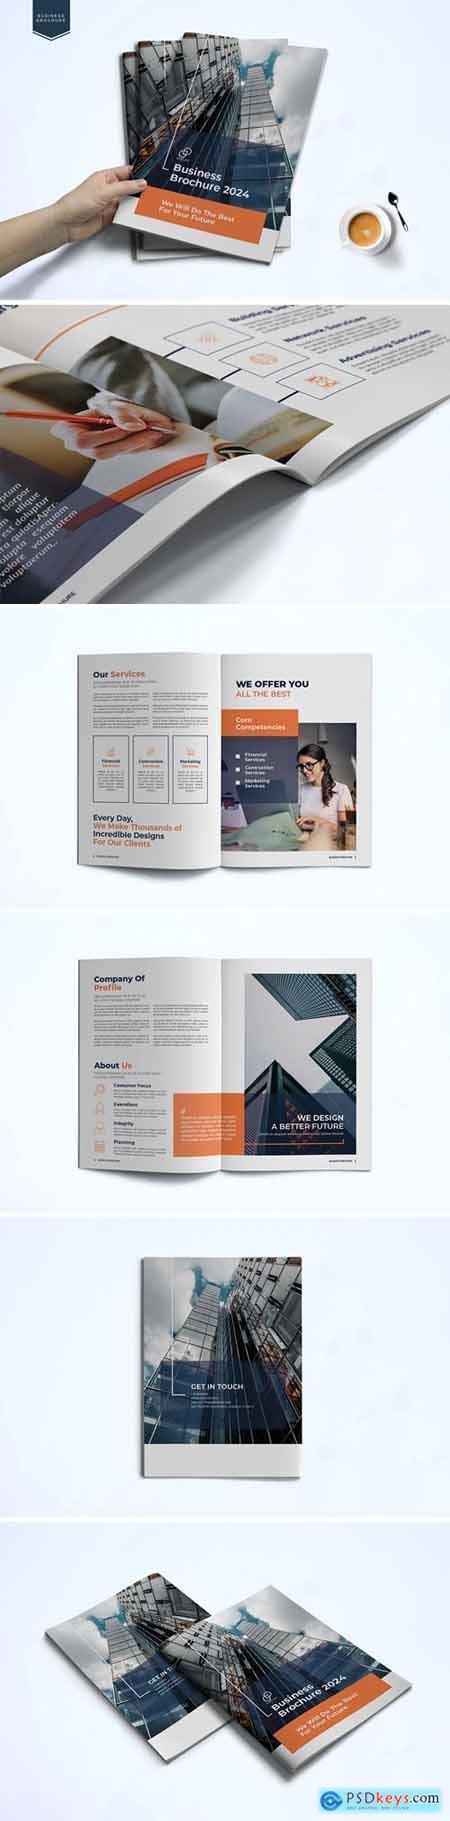 Business Brochure Template L8KYRFC